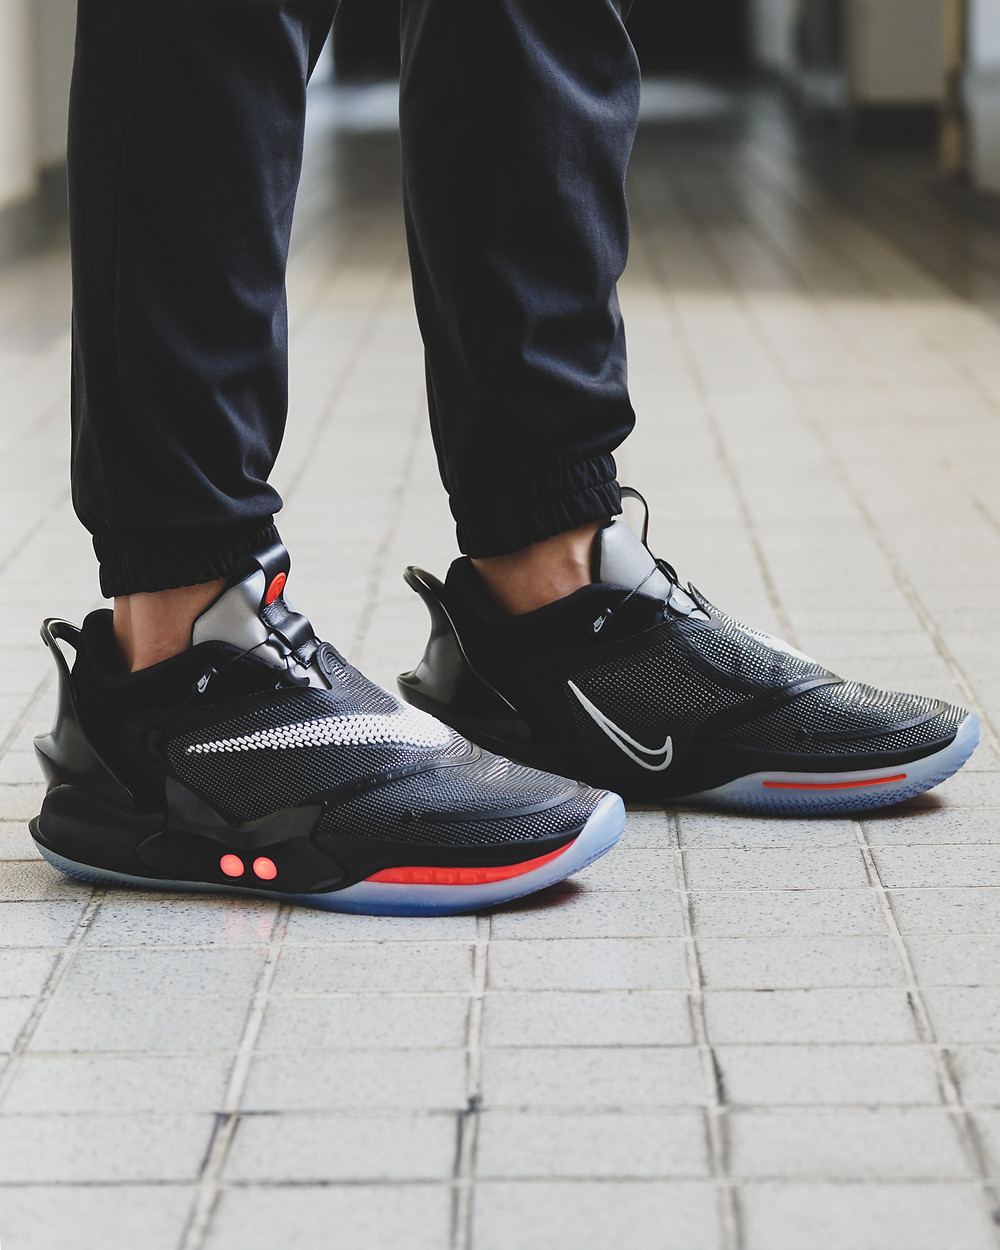 نفسها يزور قروي Nike Adapt On Feet Kevinstead Com